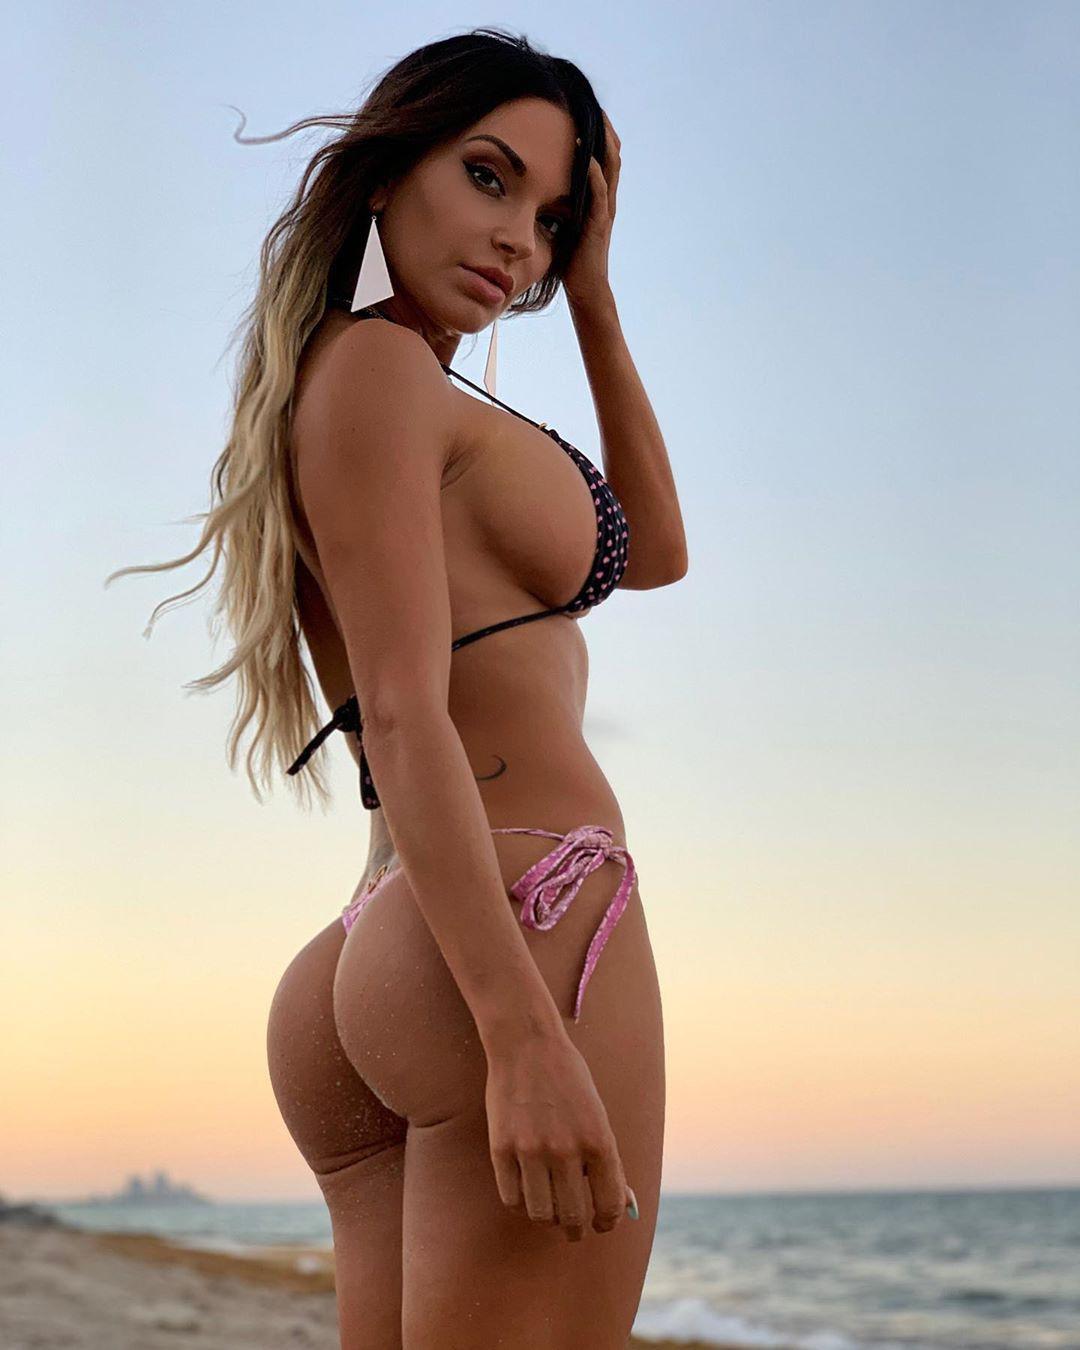 Nienna Jade lingerie, bikini swimwear